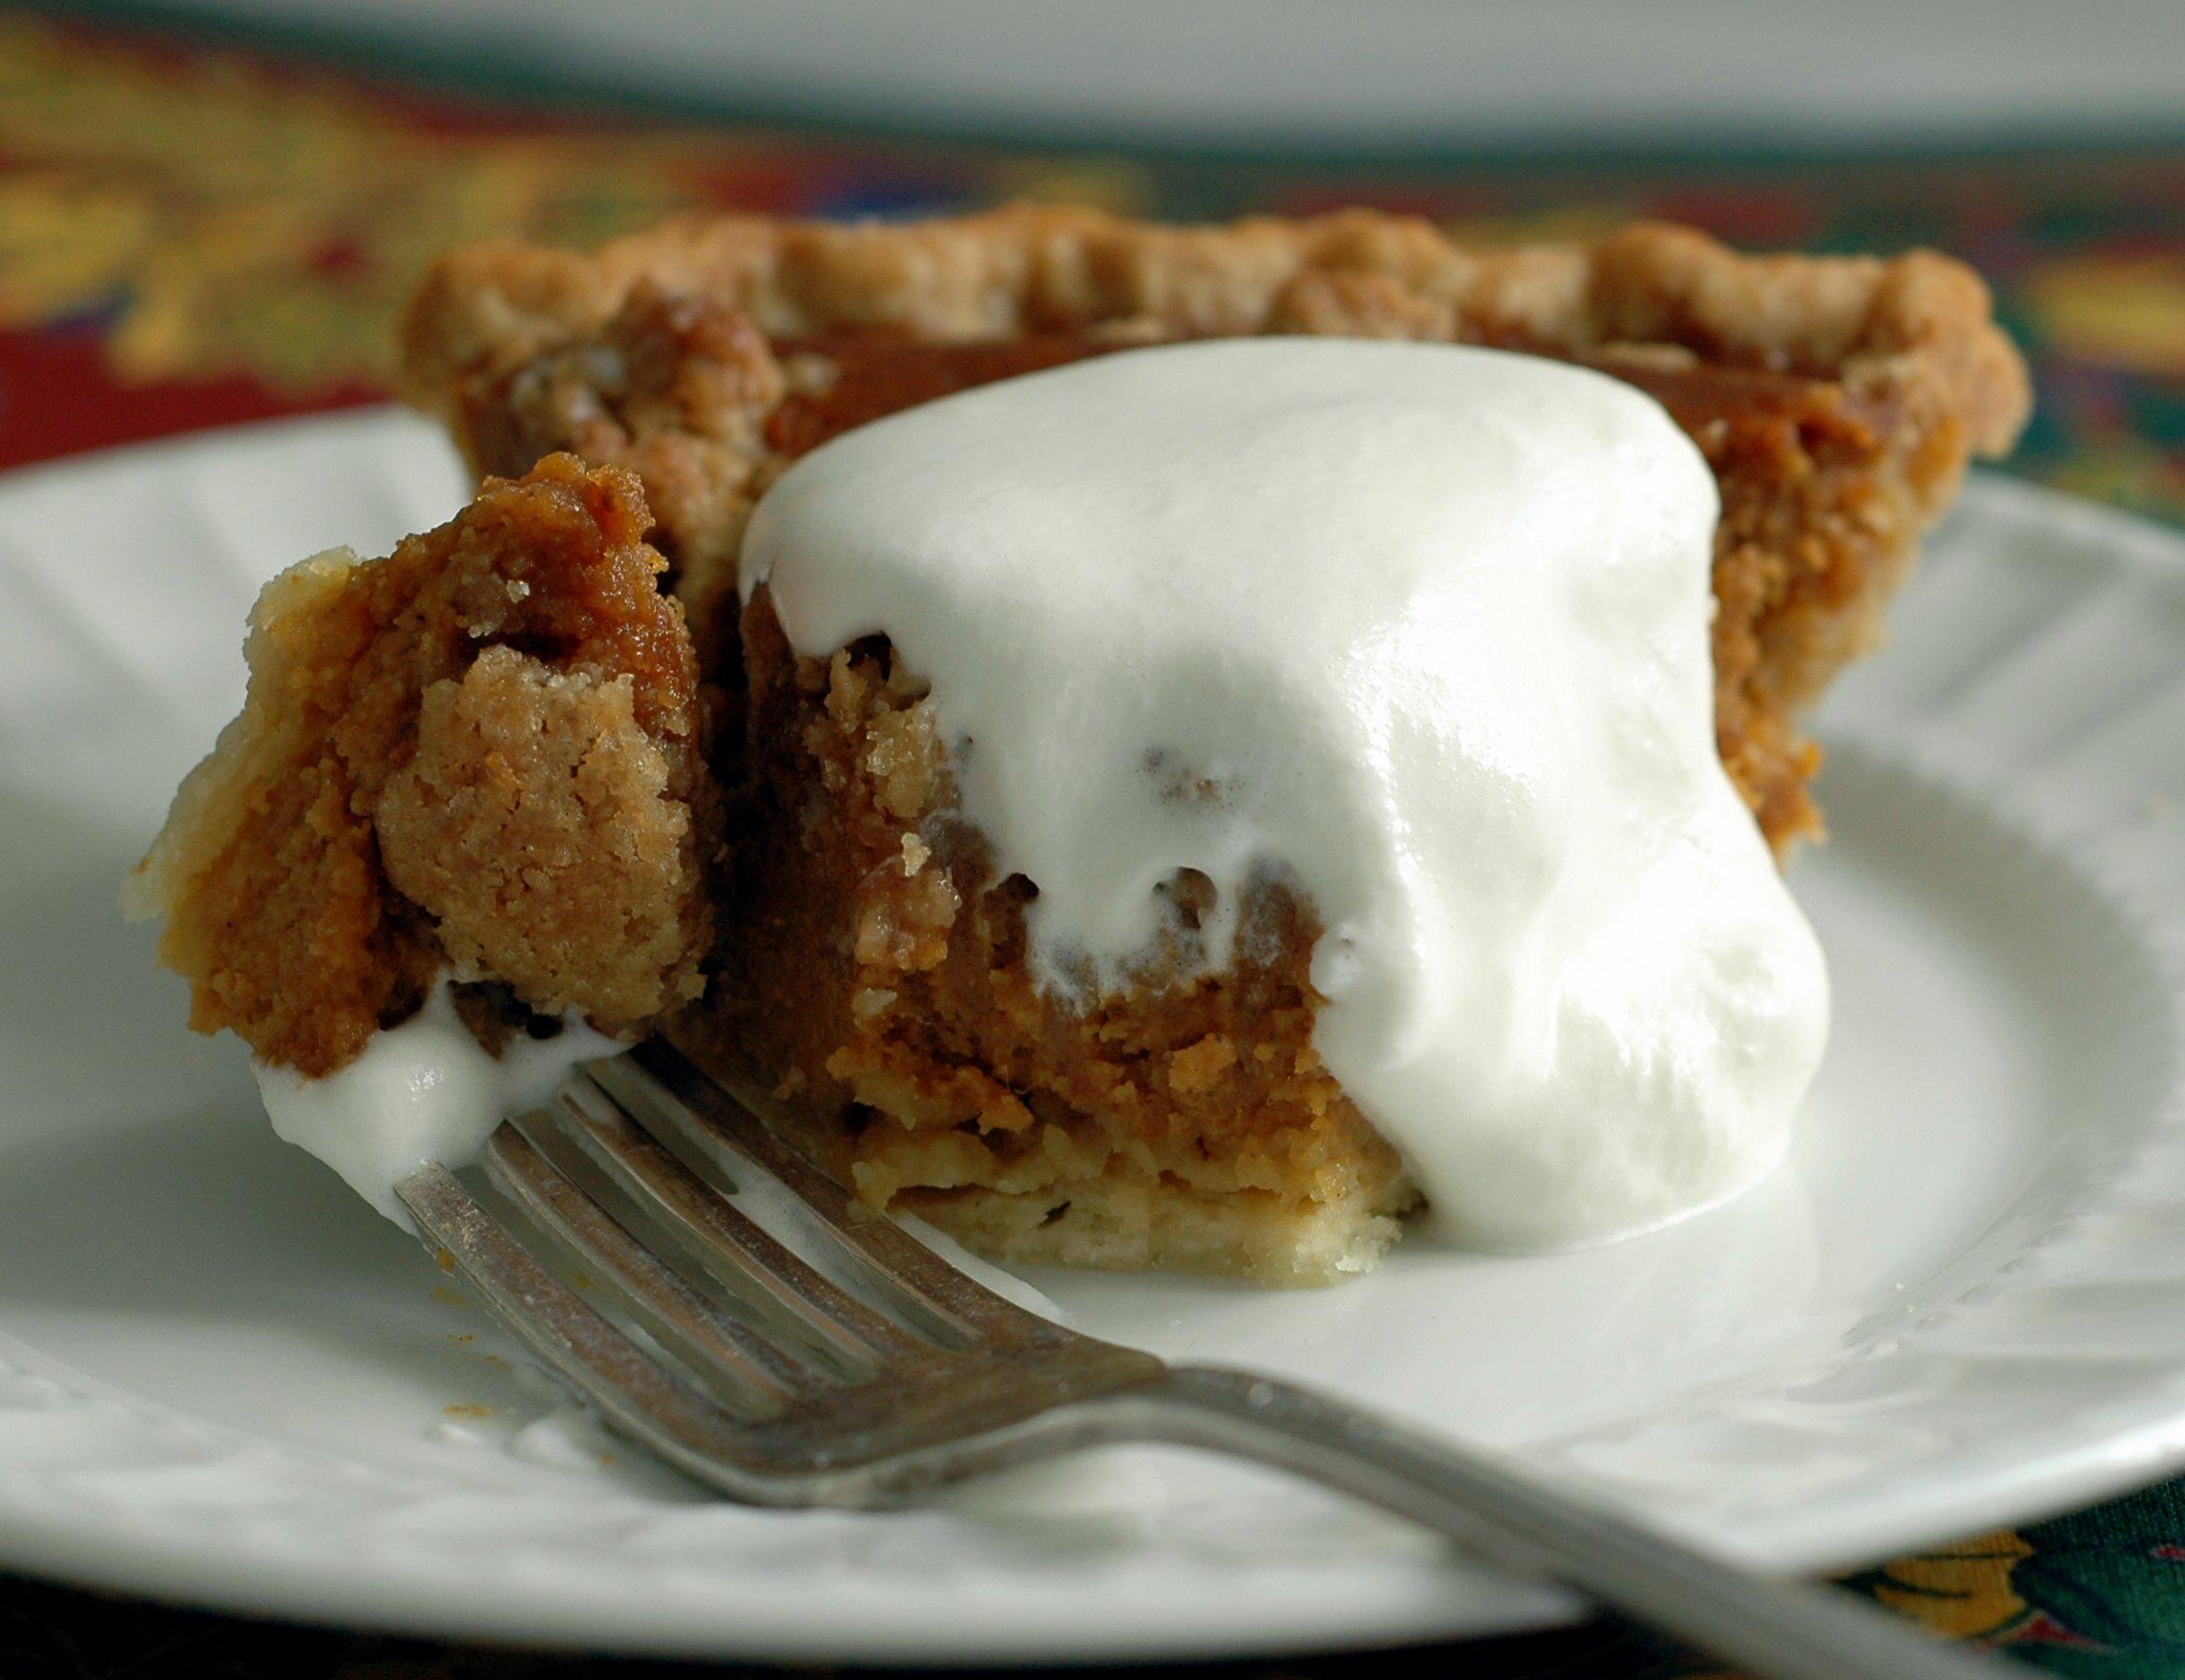 One bite Caramel Pumpkin Pie with Pecan Streusel